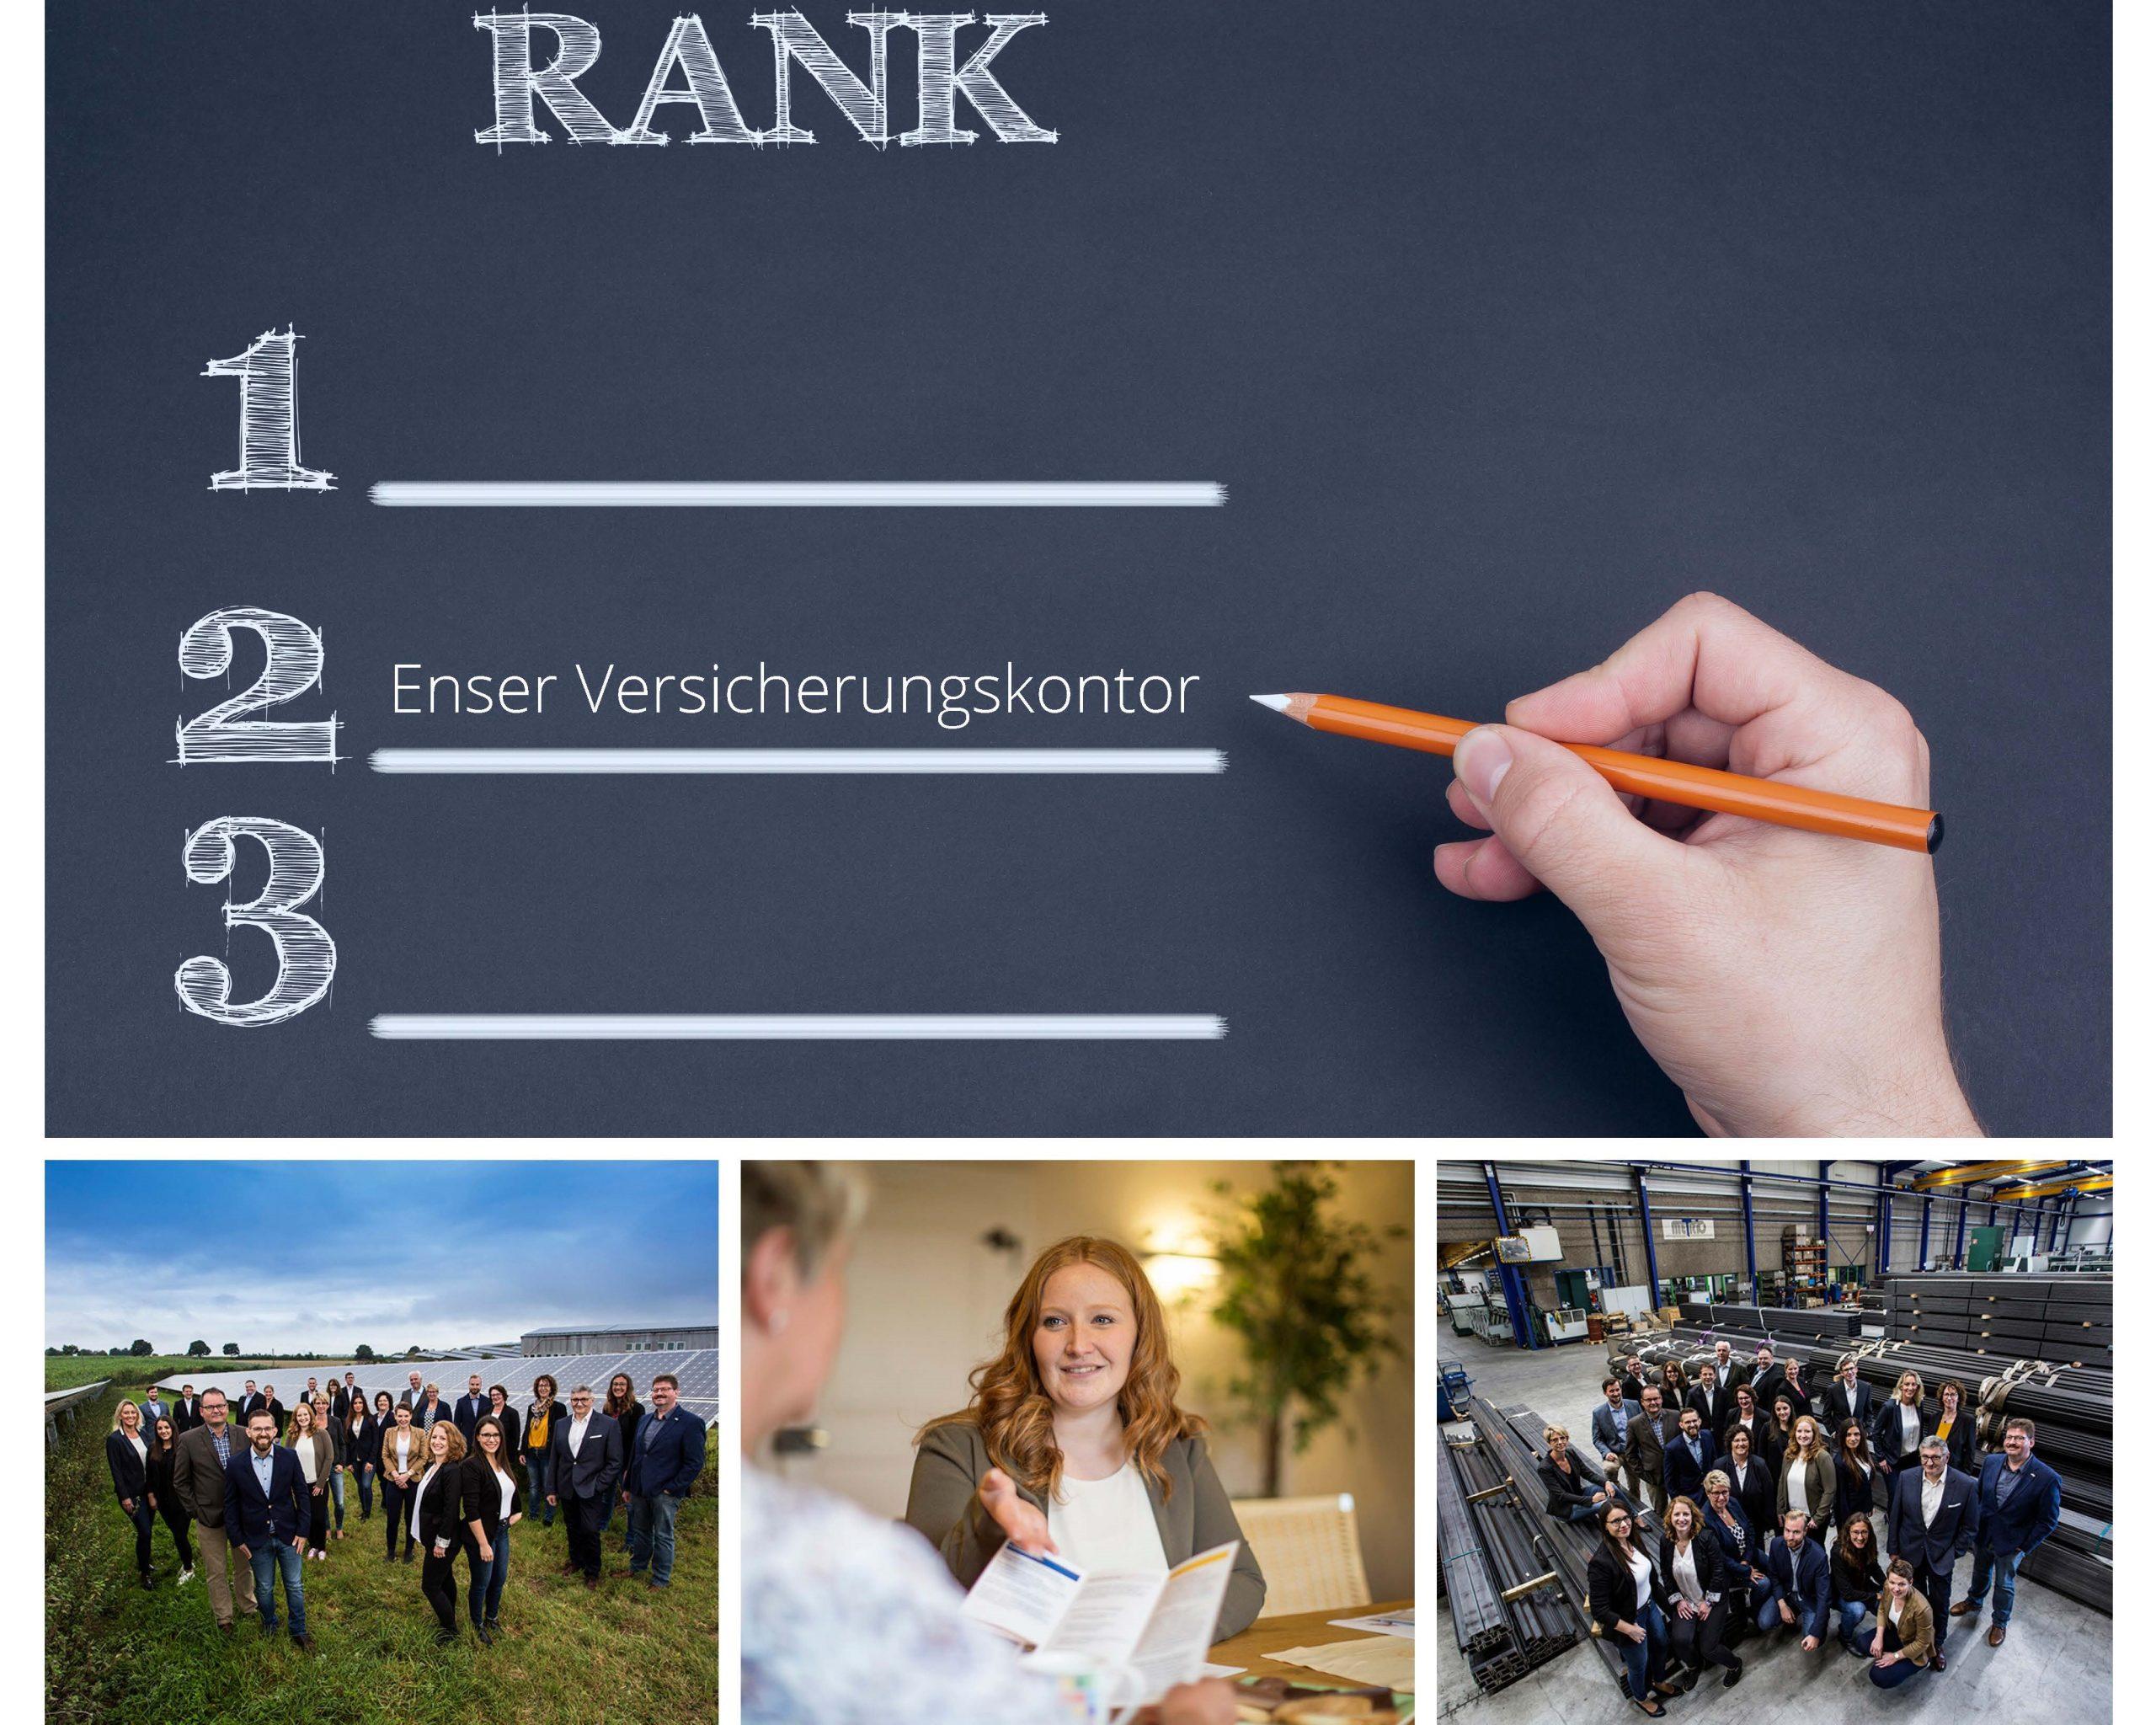 Fotocollage Ranking Südwestfalen Manager